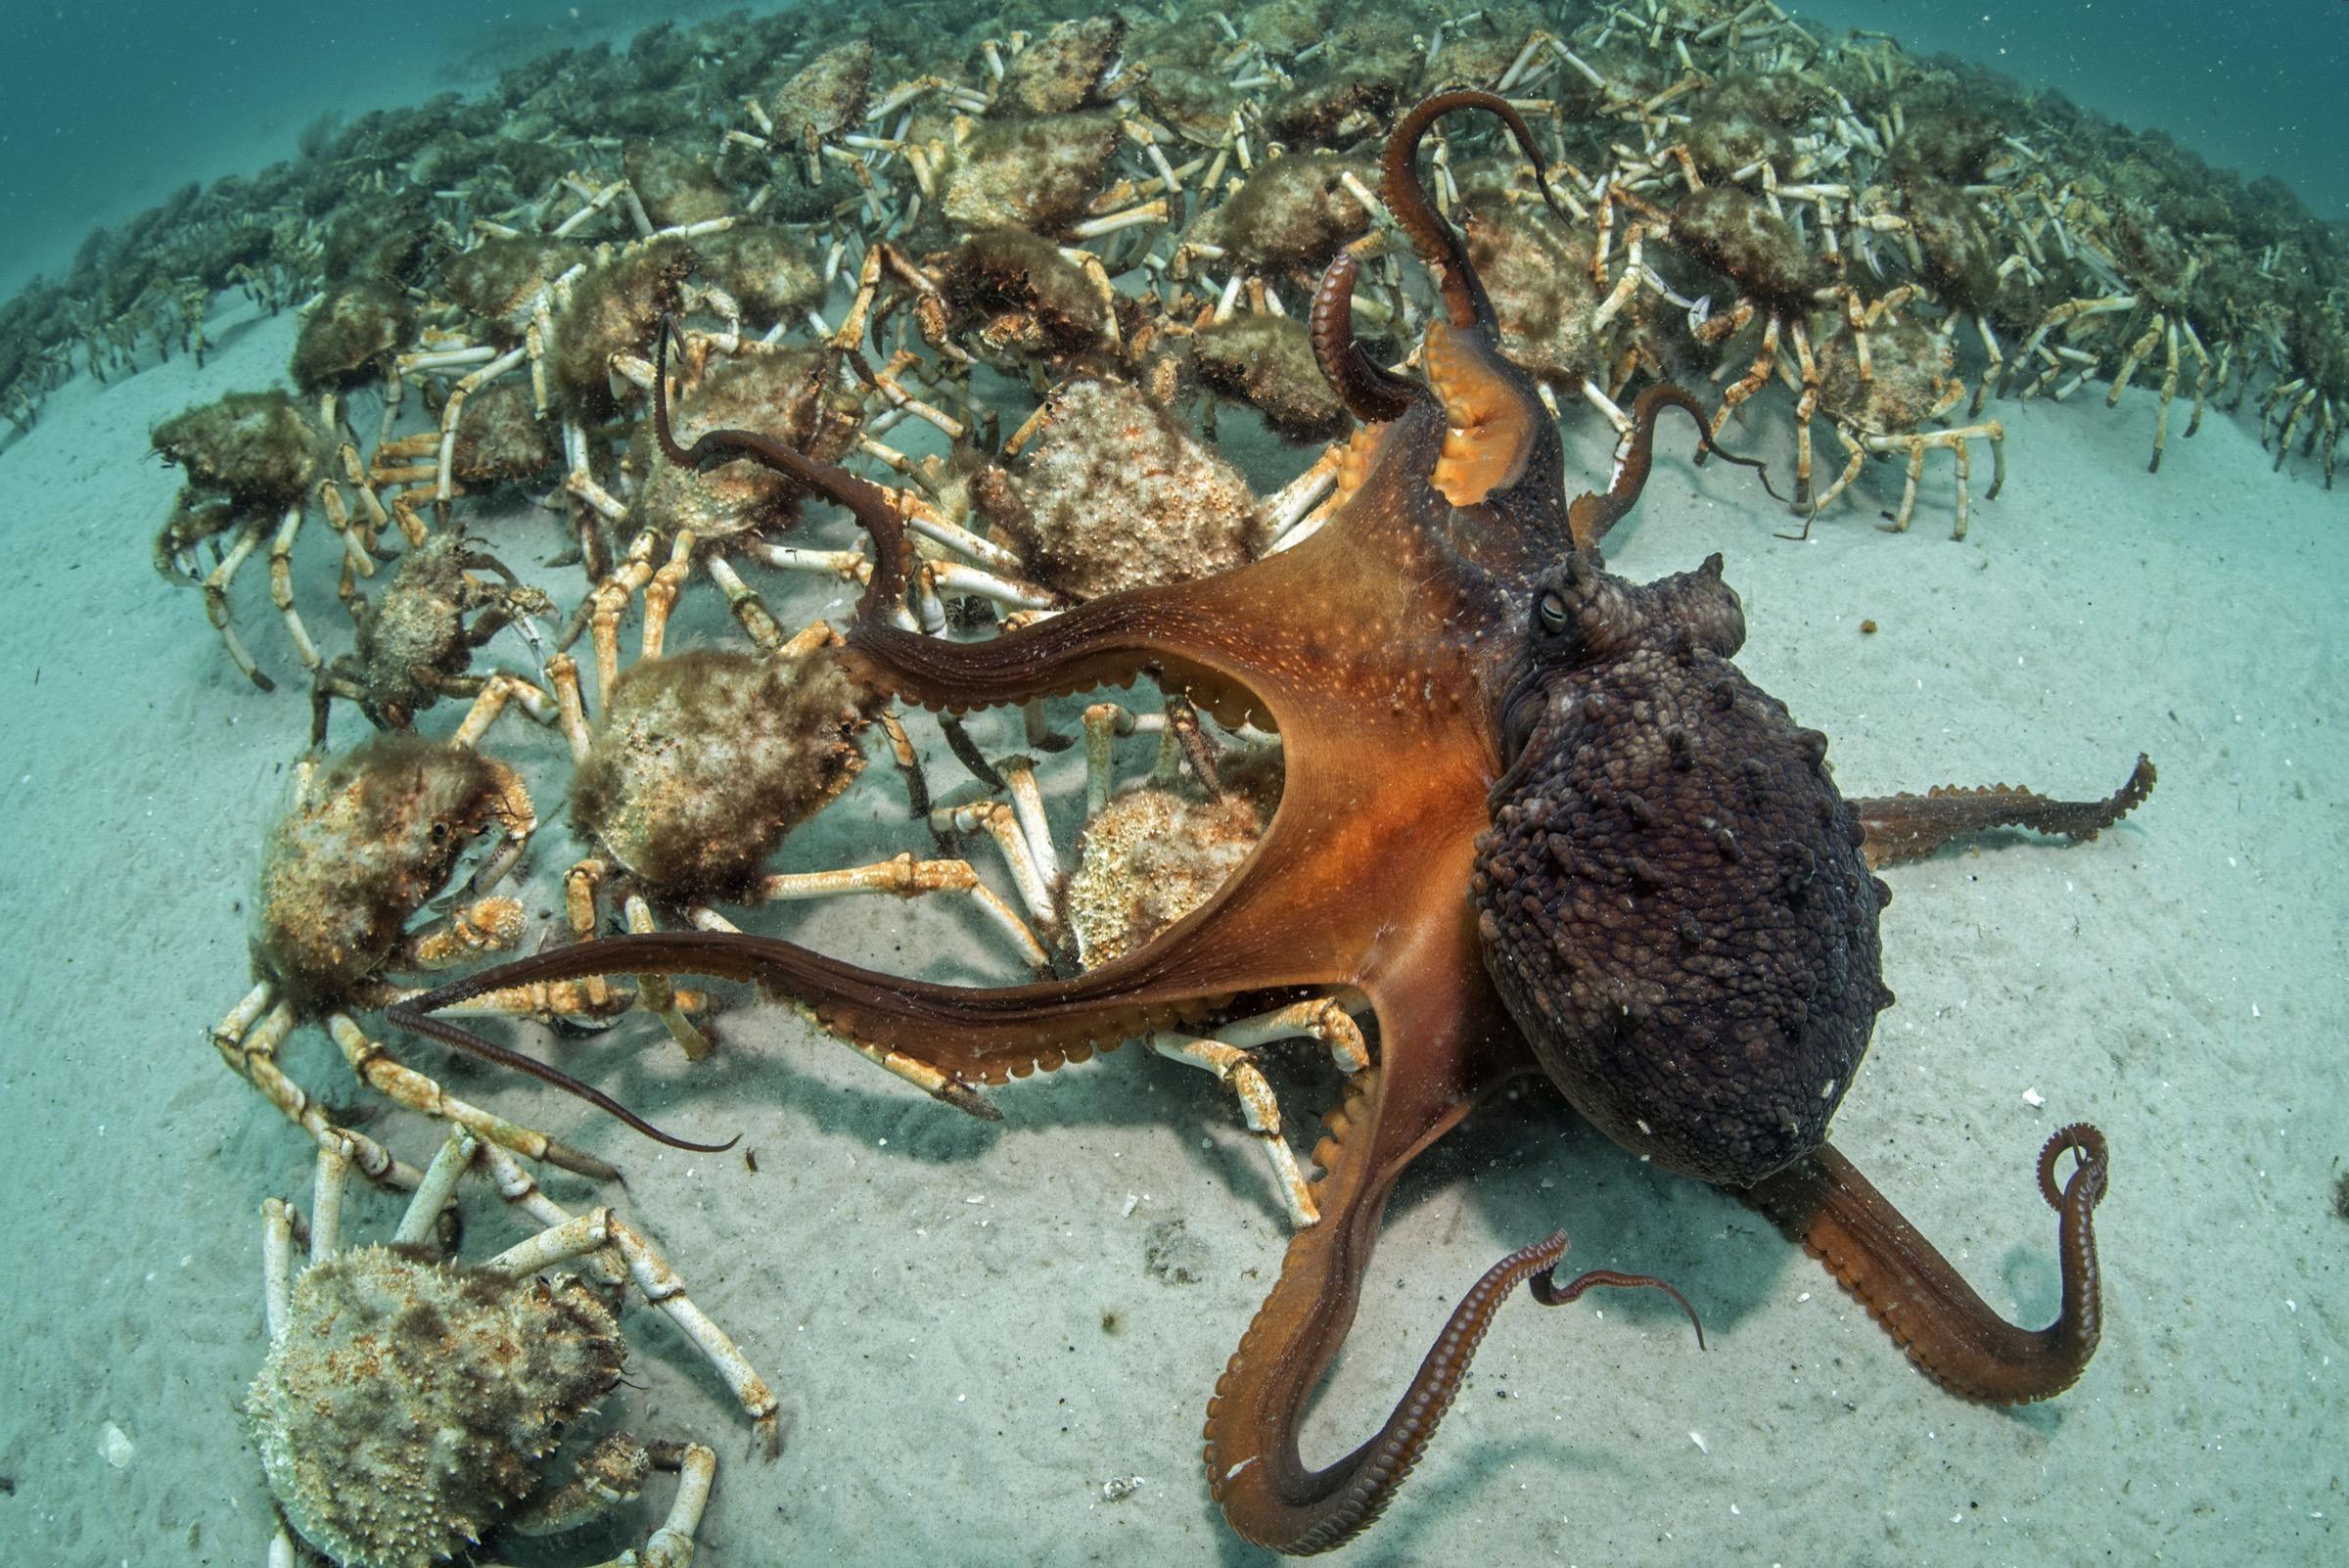 Maori octopus (Macroctopus maorum)